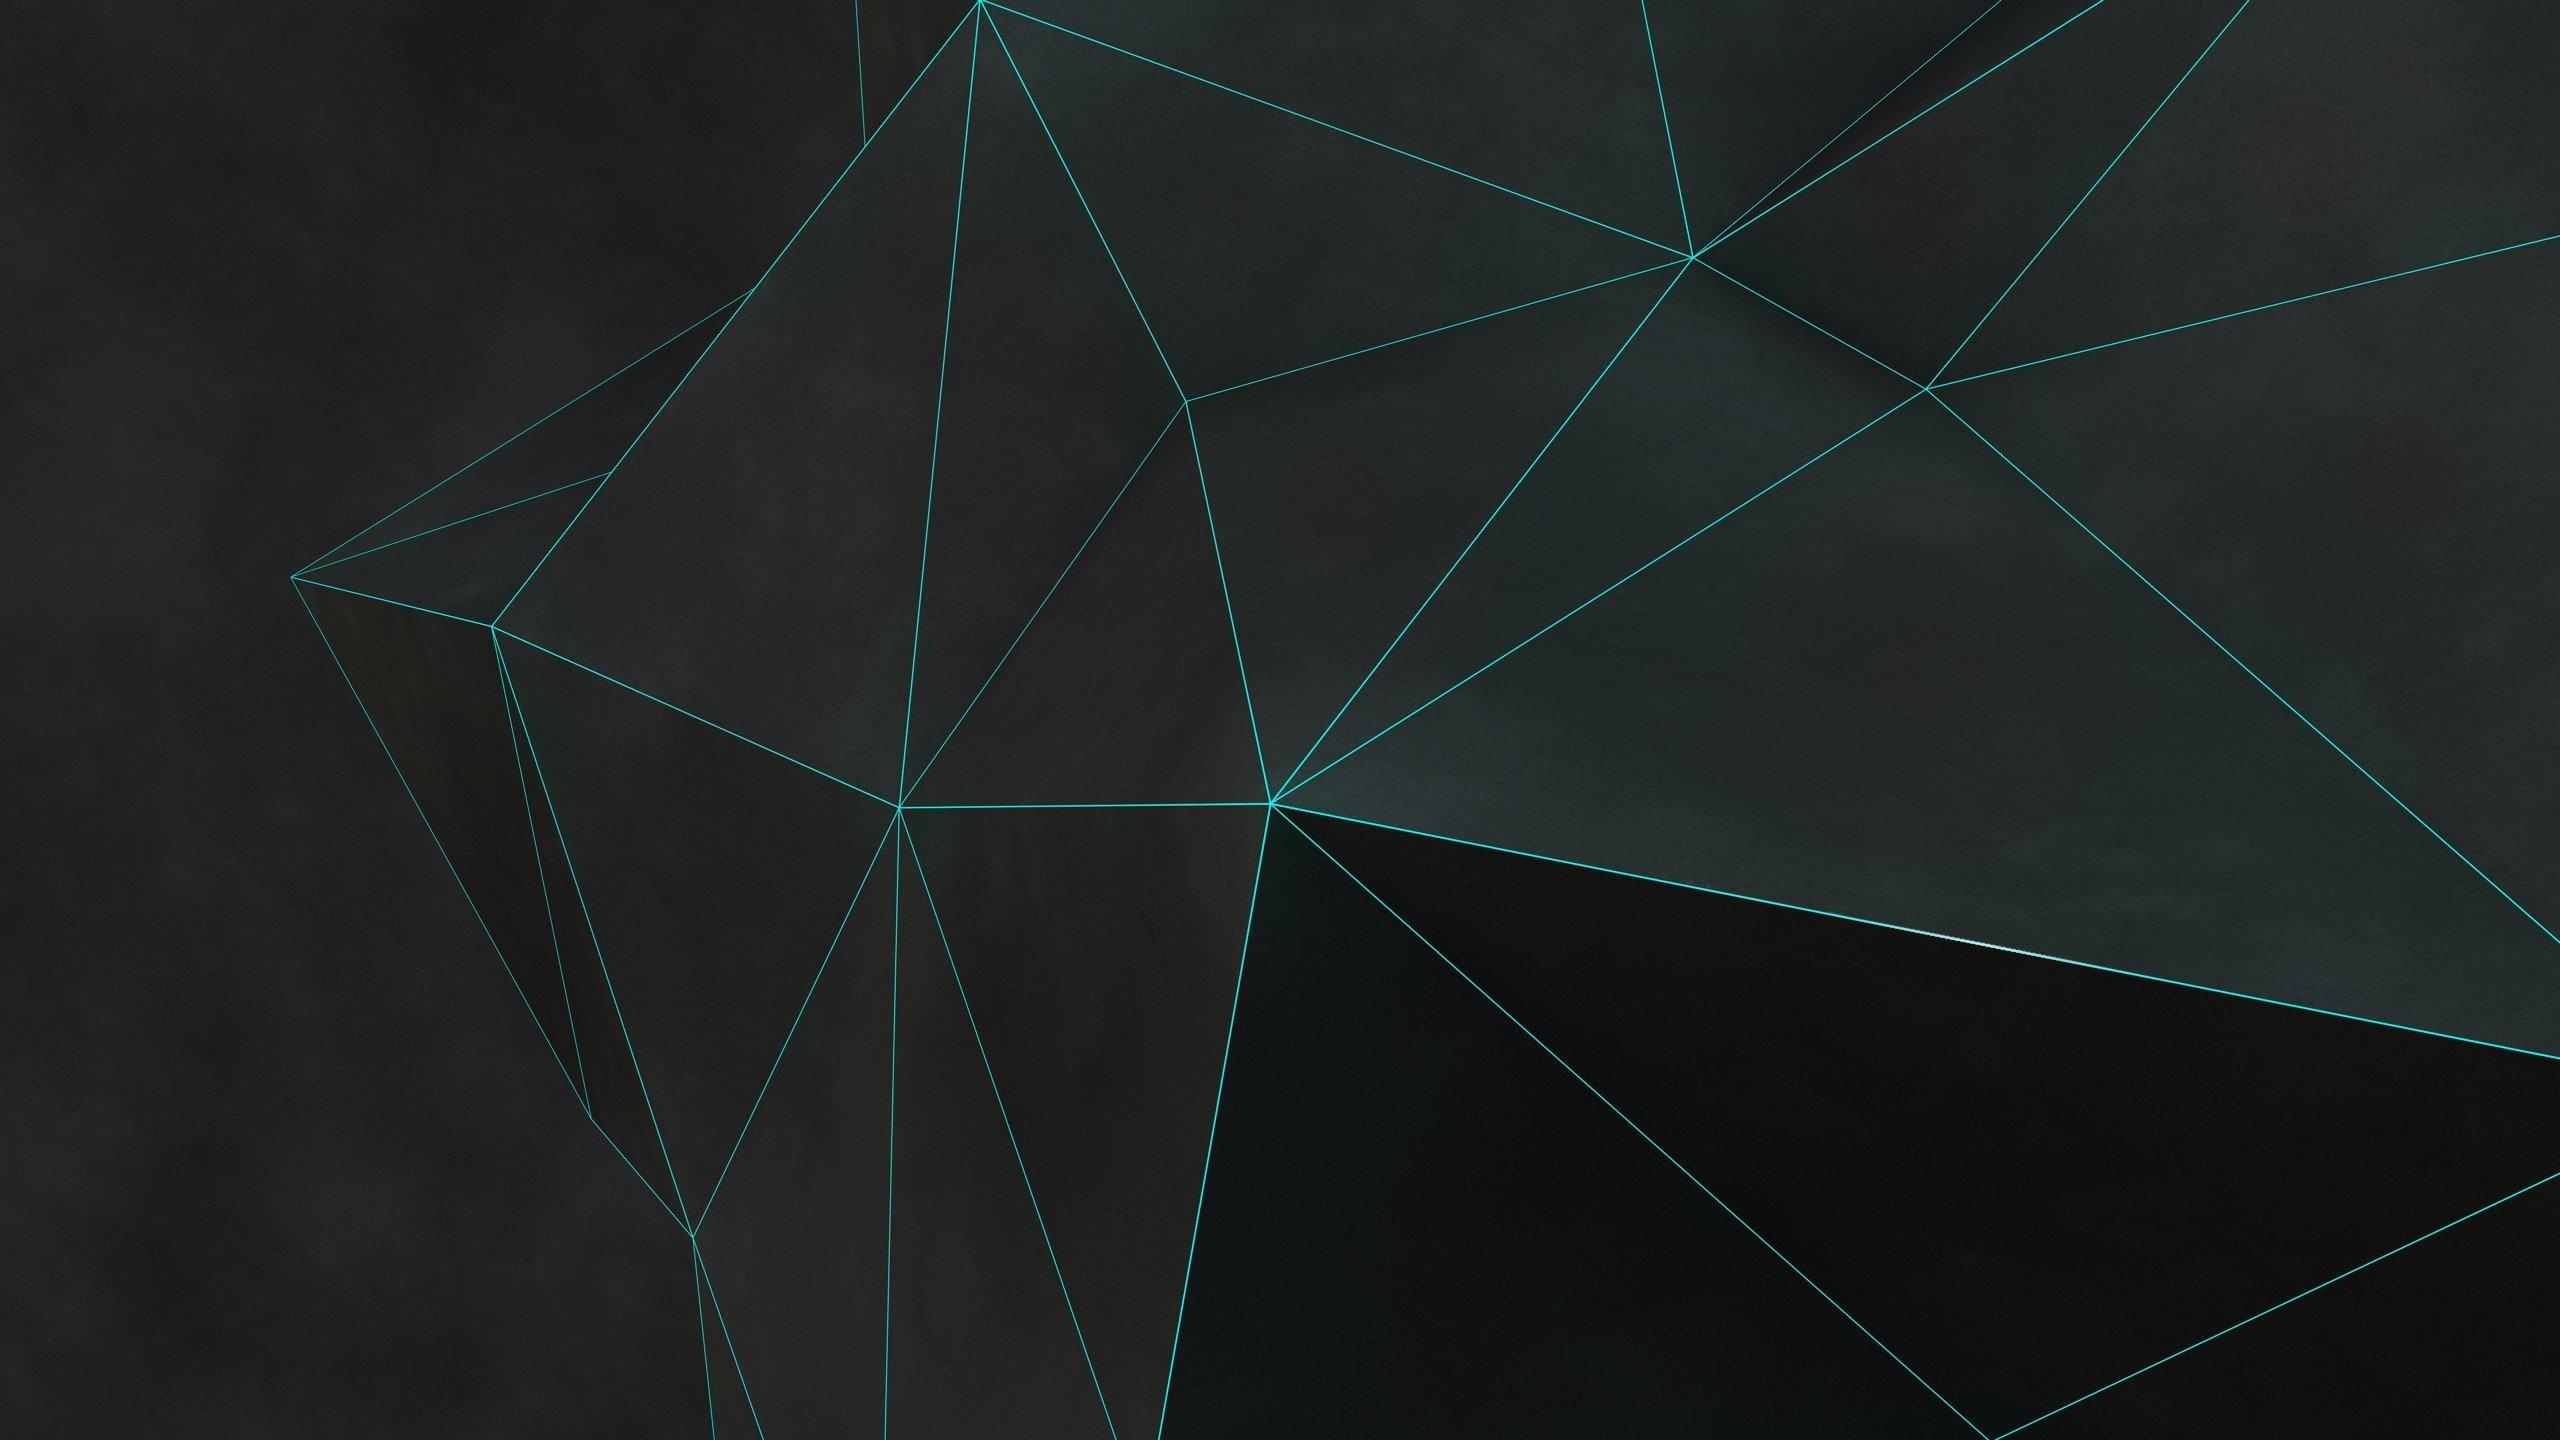 sacred geometry wallpaper iphone 6